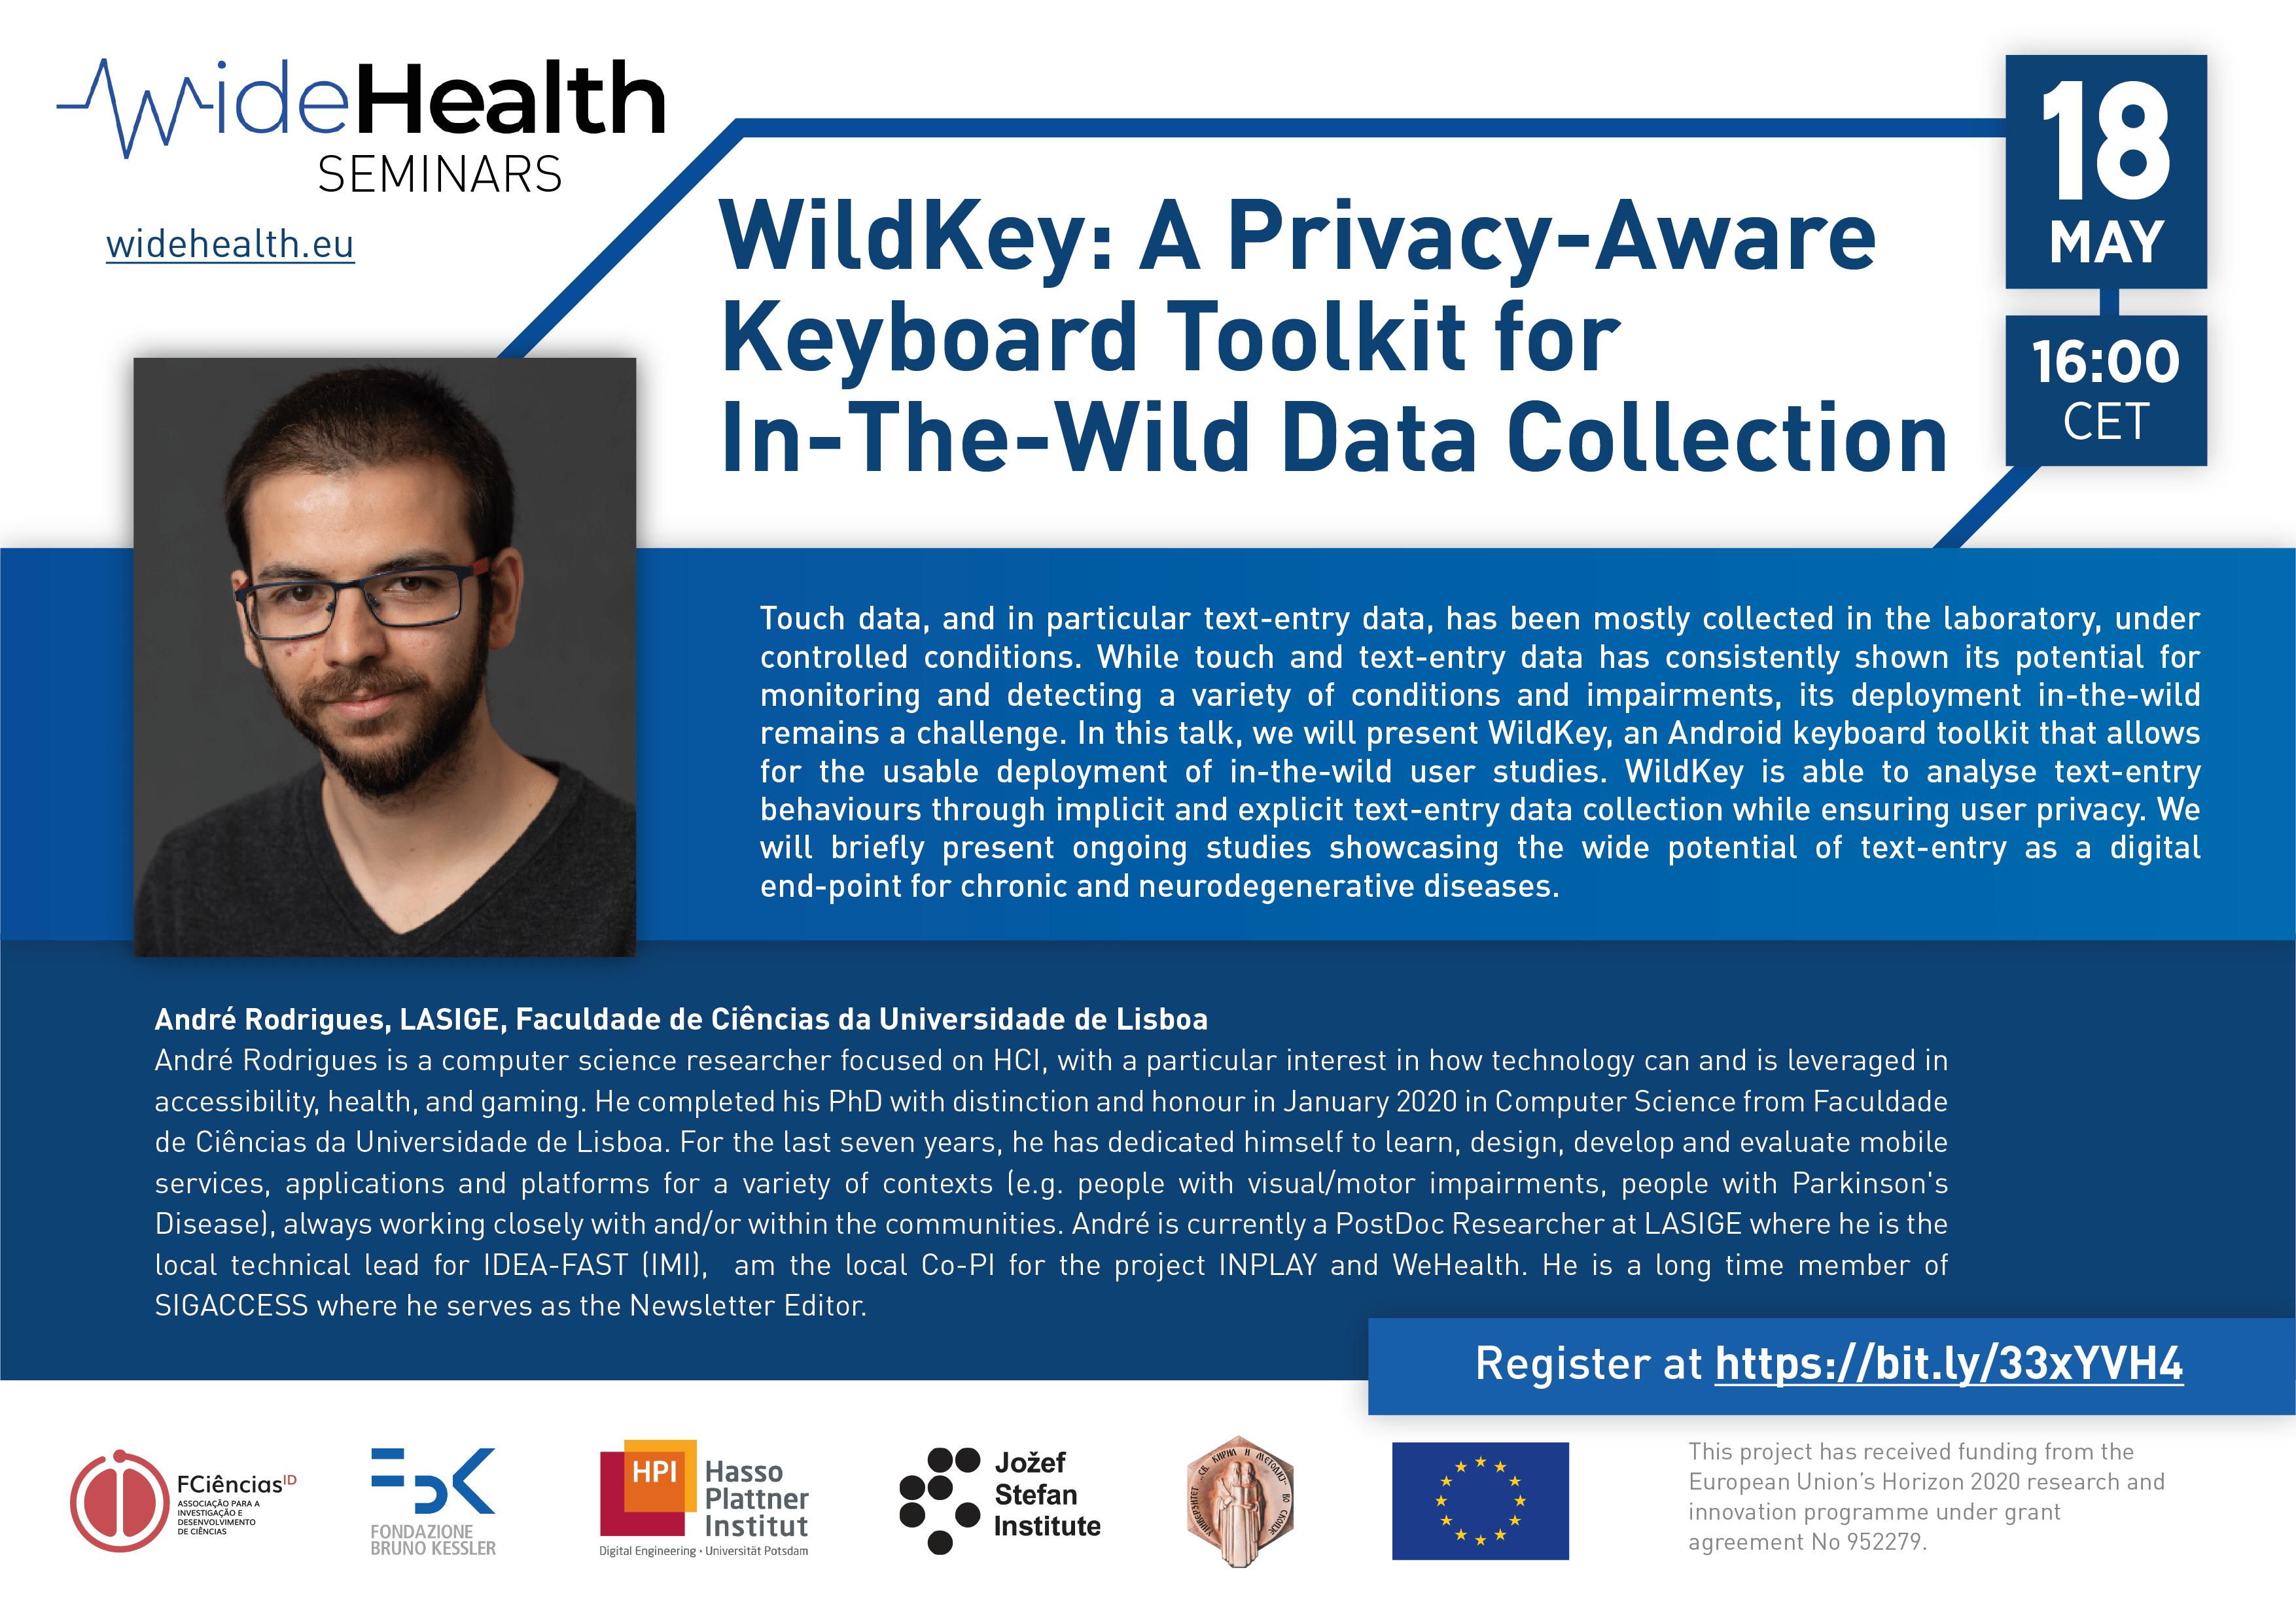 2nd WideHealth Seminar: André Rodrigues